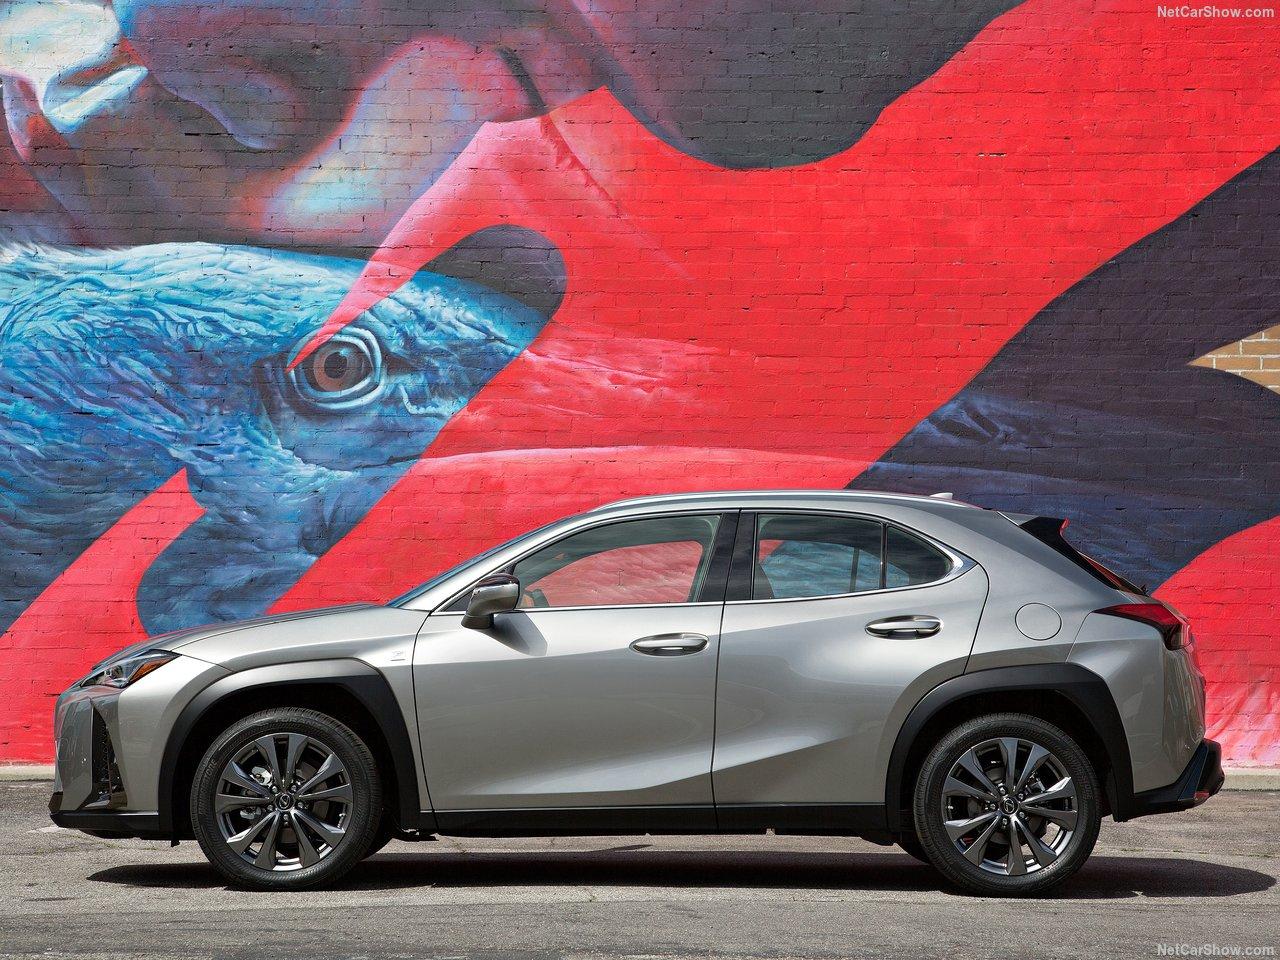 Lexus-UX-2019-1280-0a.jpg